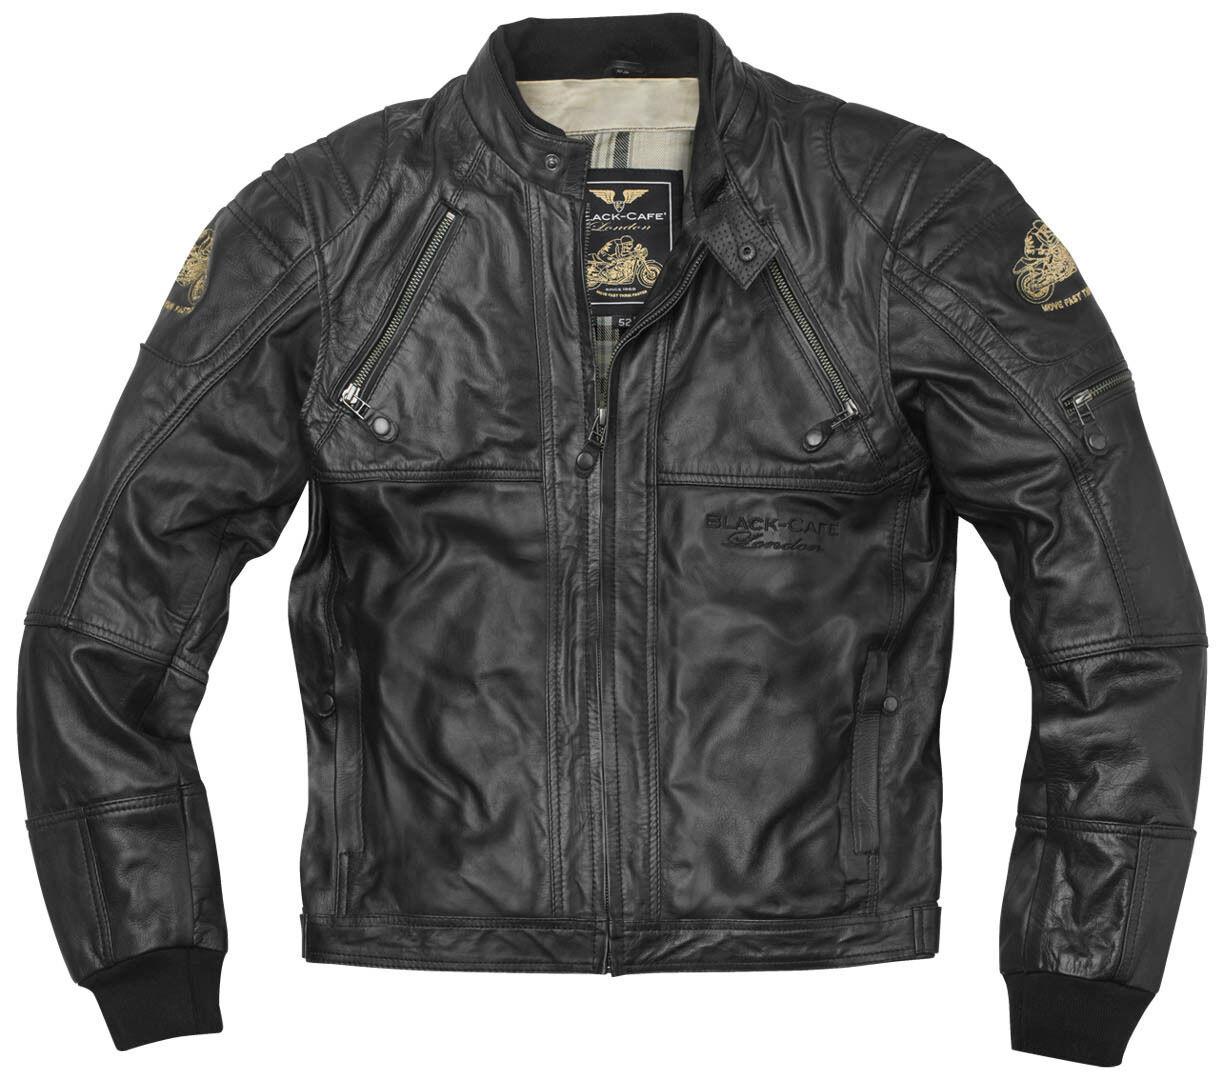 Black-Cafe London Dallas Veste en cuir de moto Noir taille : 48